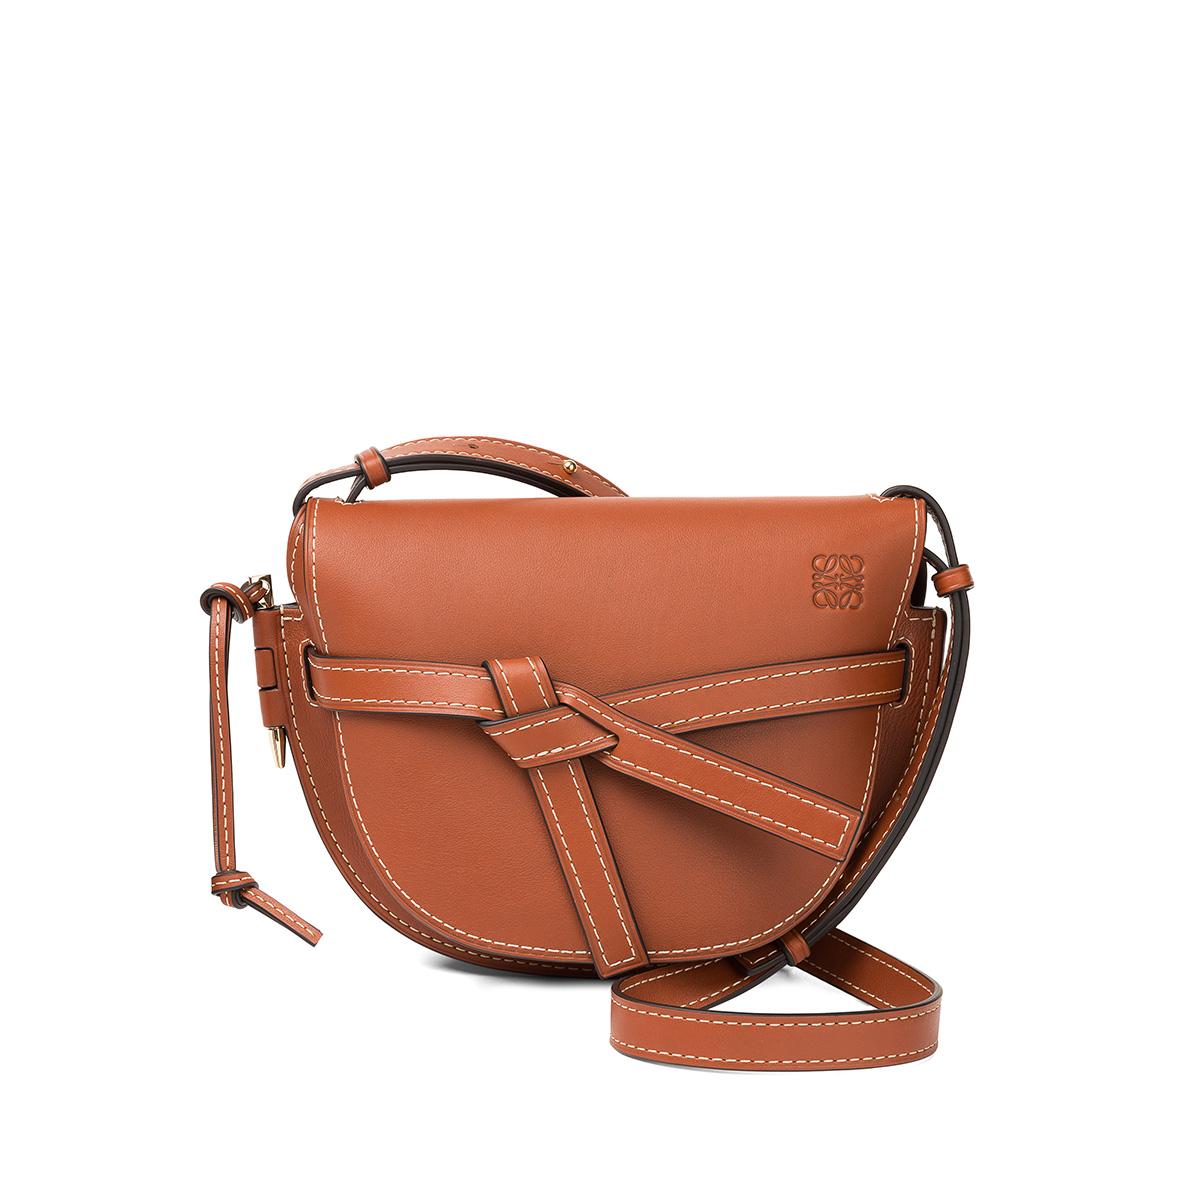 Gate Small Bag Rust Color Loewe